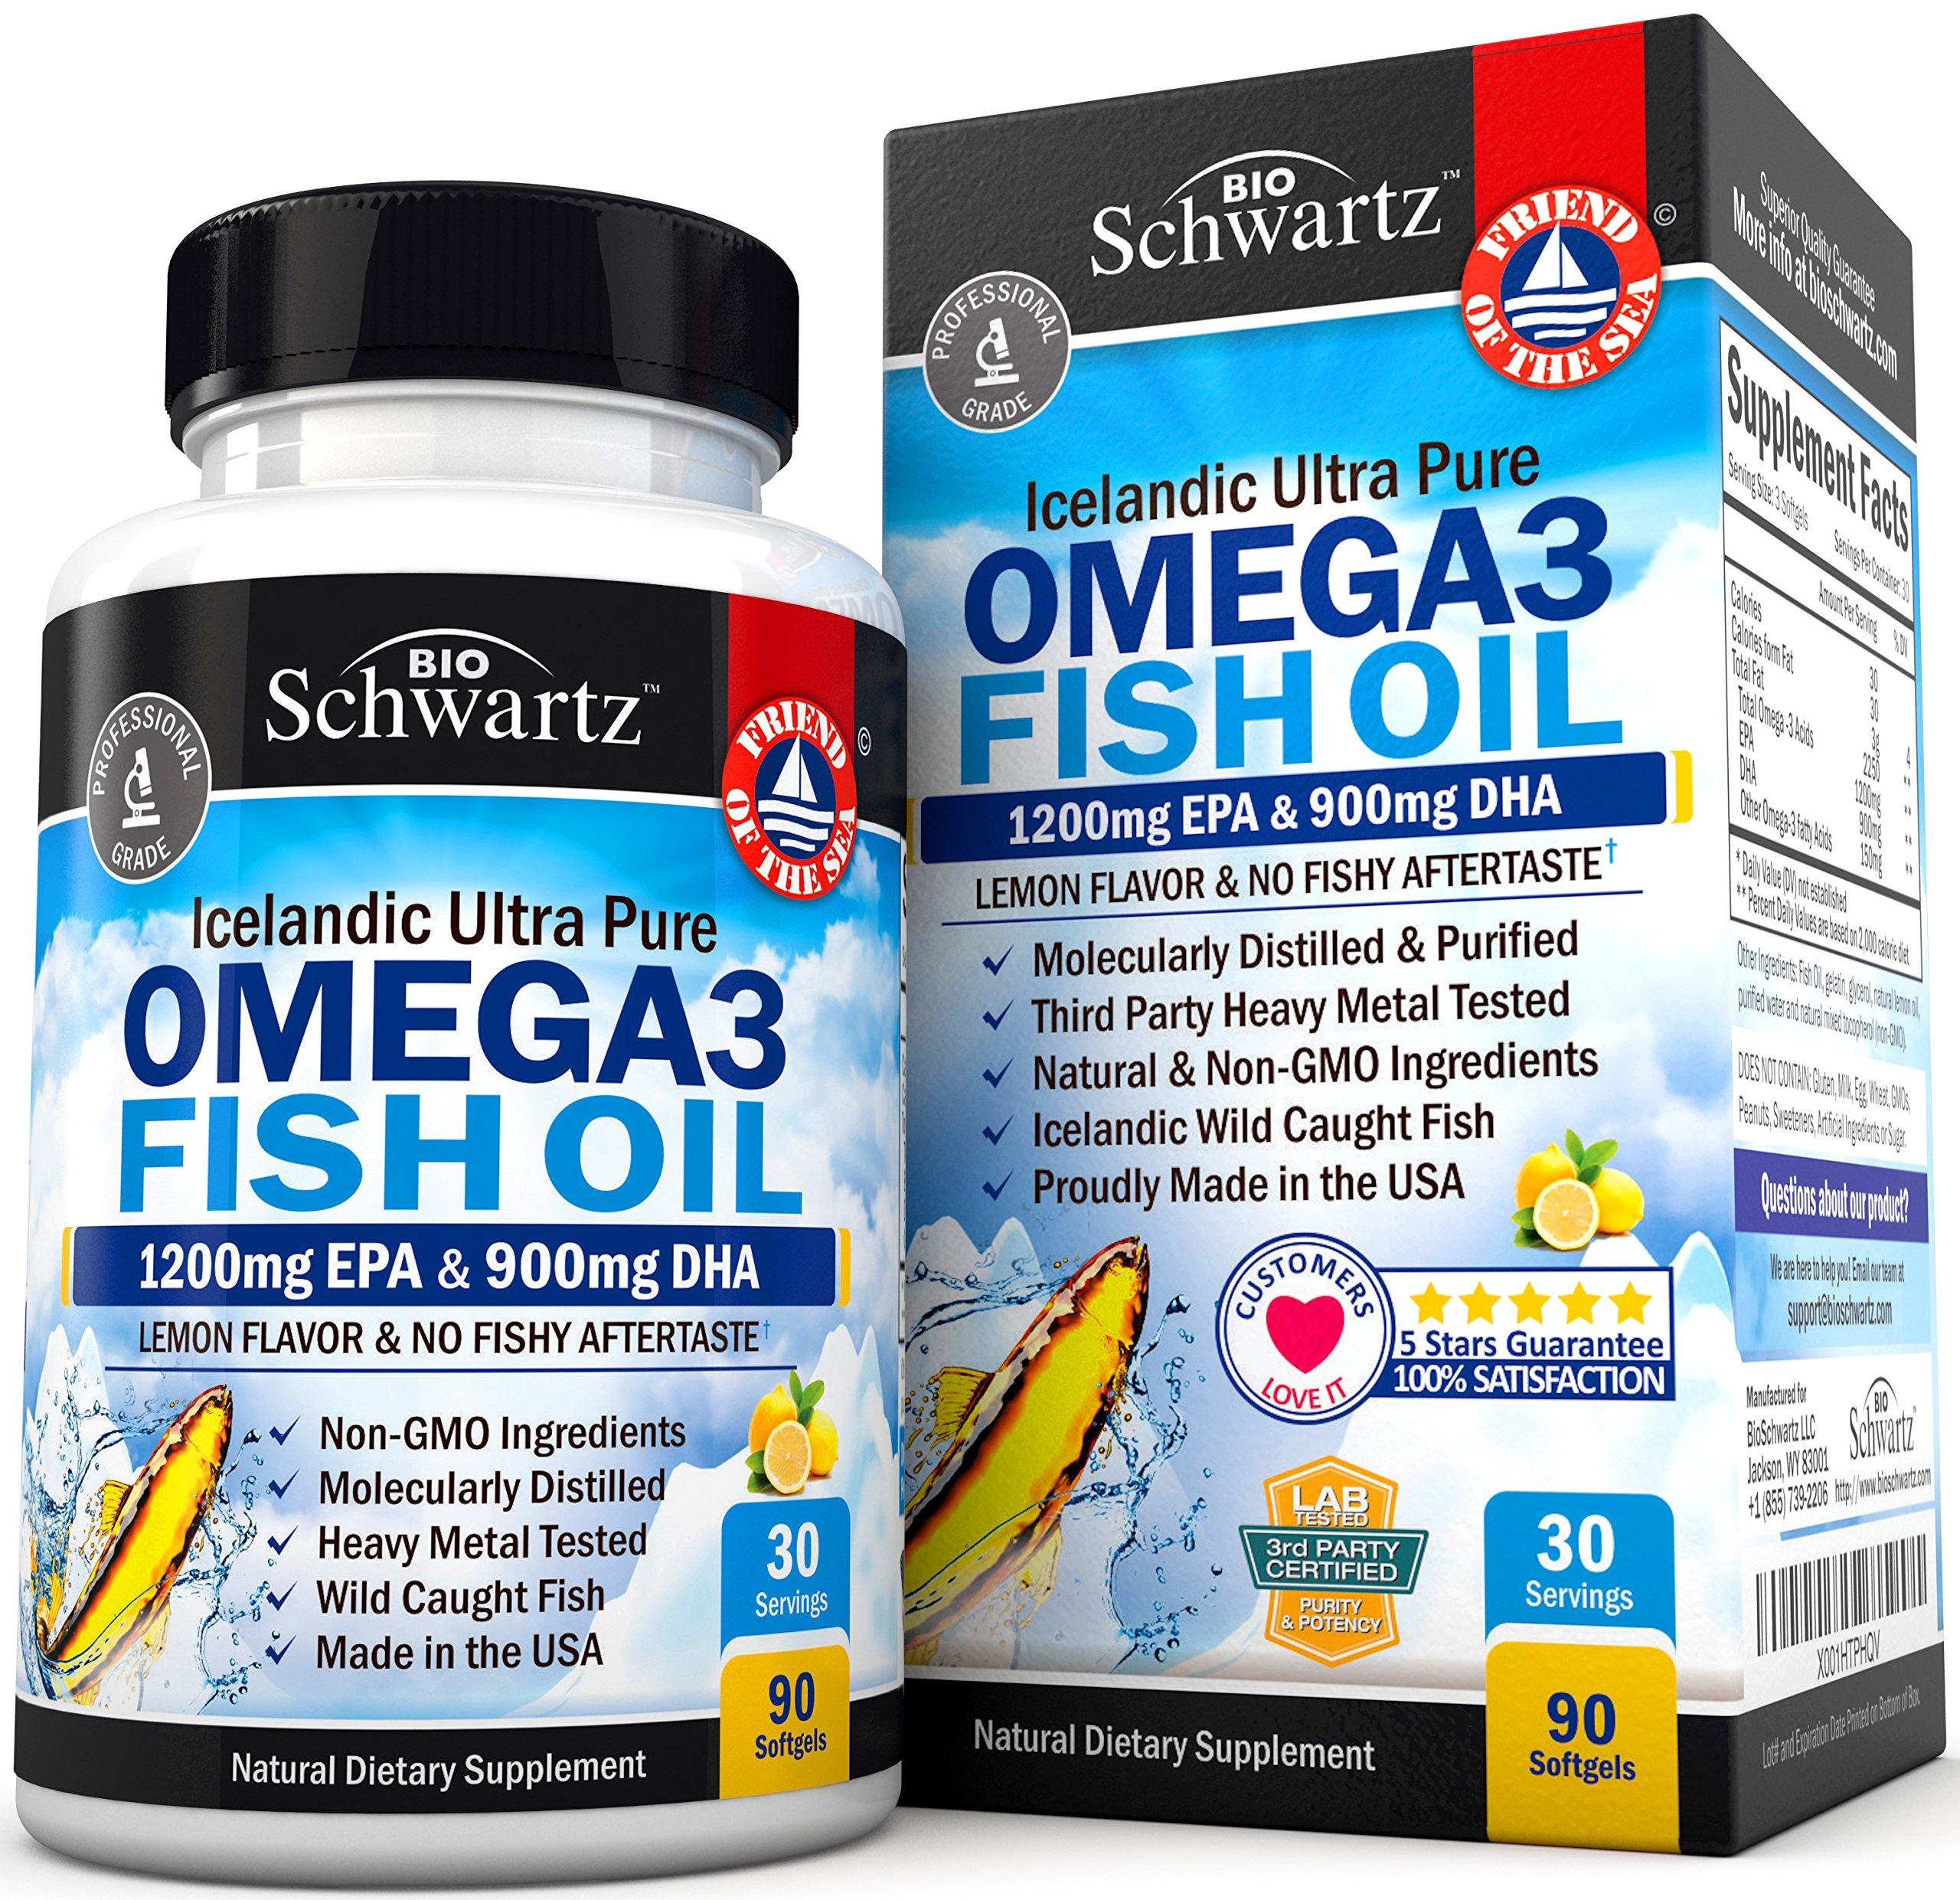 Omega 3 Fish Oil Supplement - Immune & Heart Support Benefits- Promotes Joint, Eye, Brain & Skin Health - Non GMO Triglyceride Softgels - Lemon Flavor EPA 1200mg, DHA 900mg Fatty Acids Gluten Free by BioSchwartz